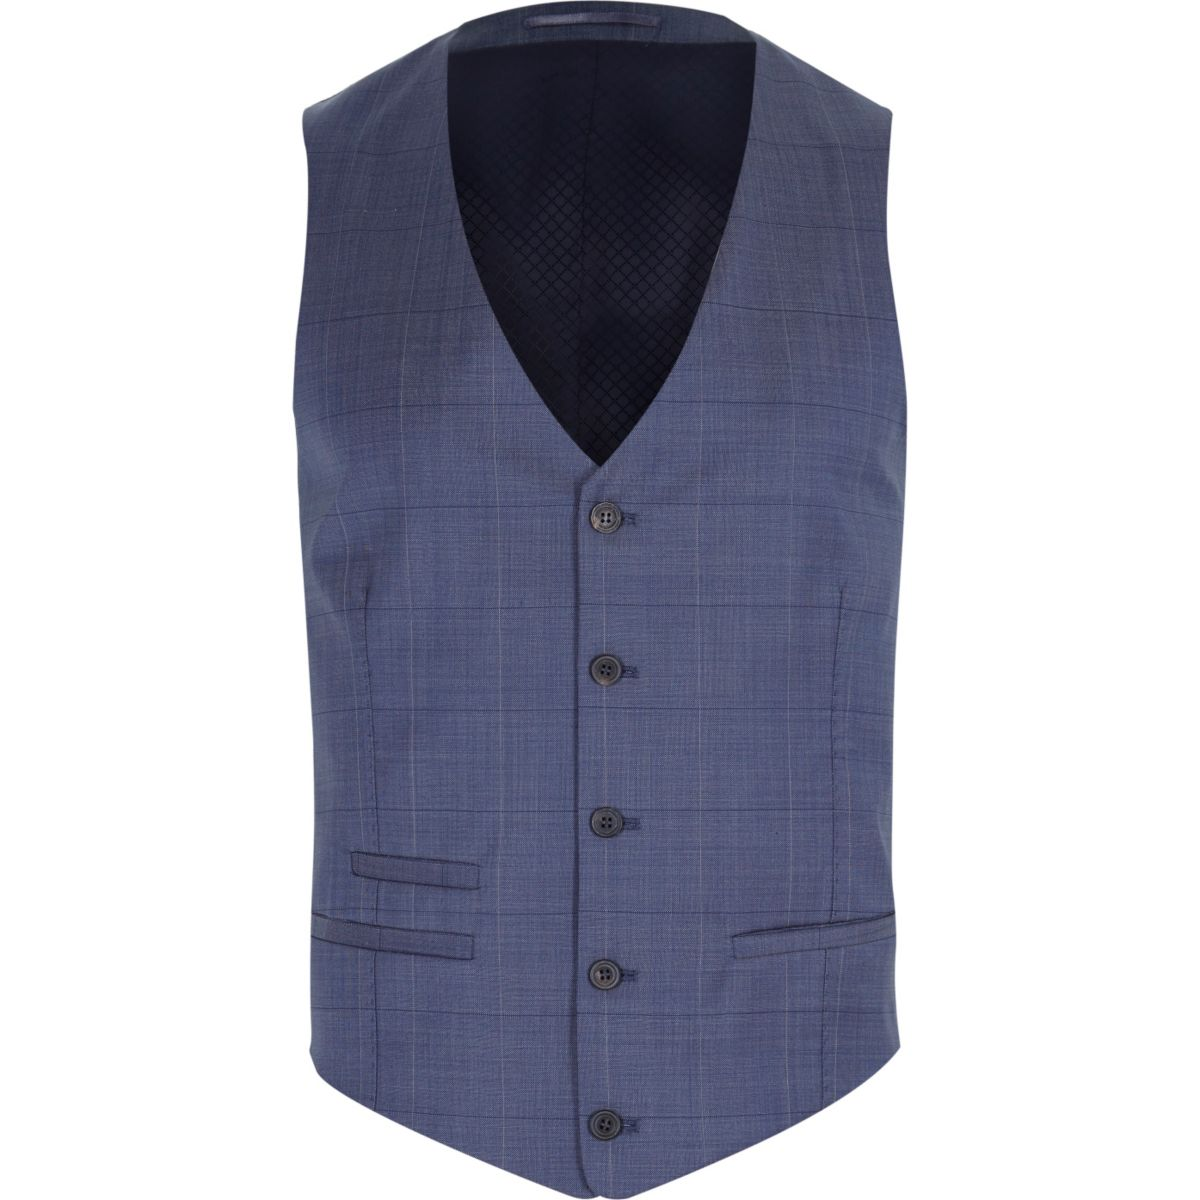 Blue subtle check wool-blend waistcoat